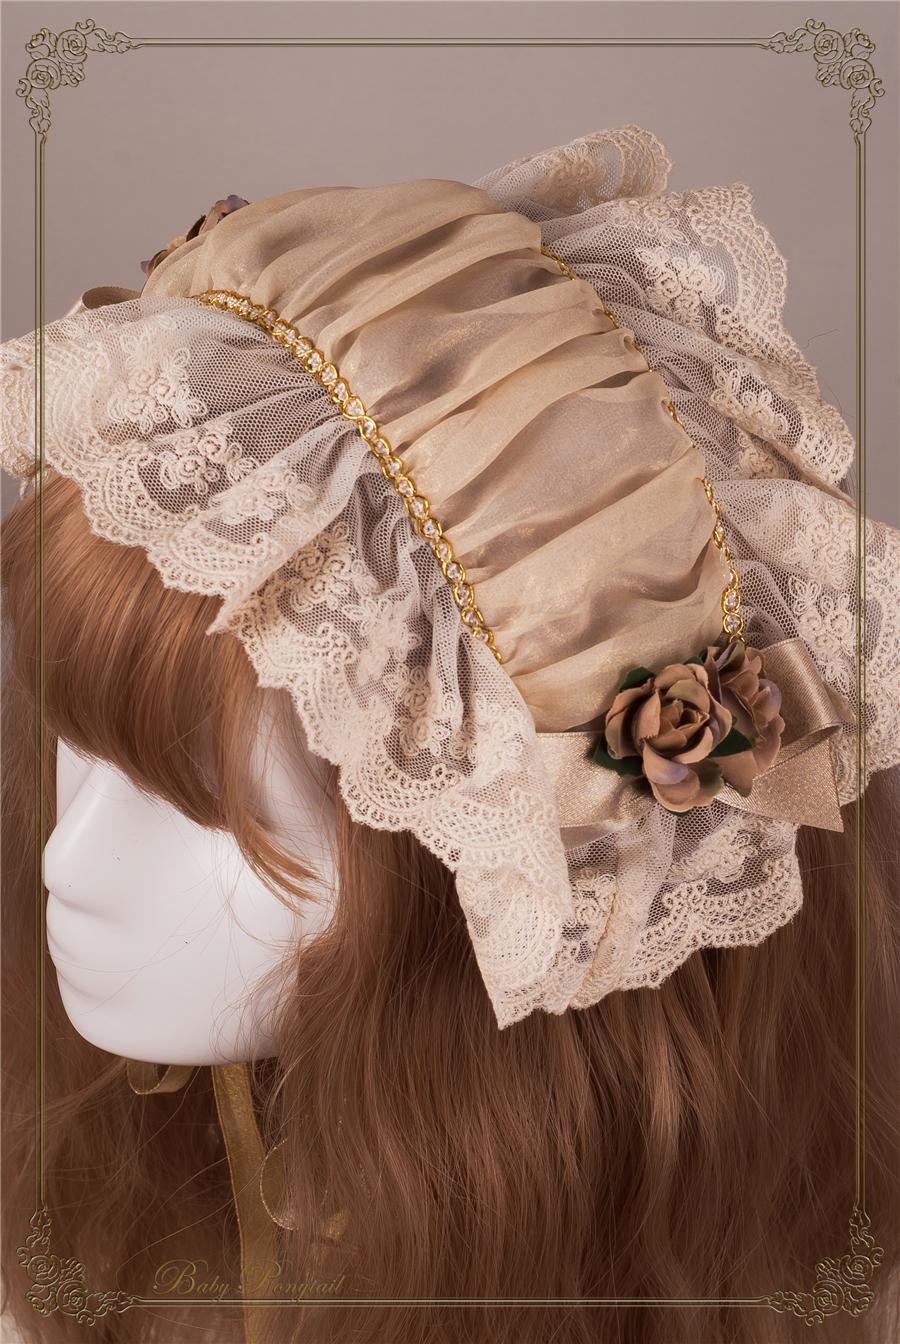 BabyPonytail_Rose Battle_Stock Photo_Petite Rose Head Dress Amber_10.jpg